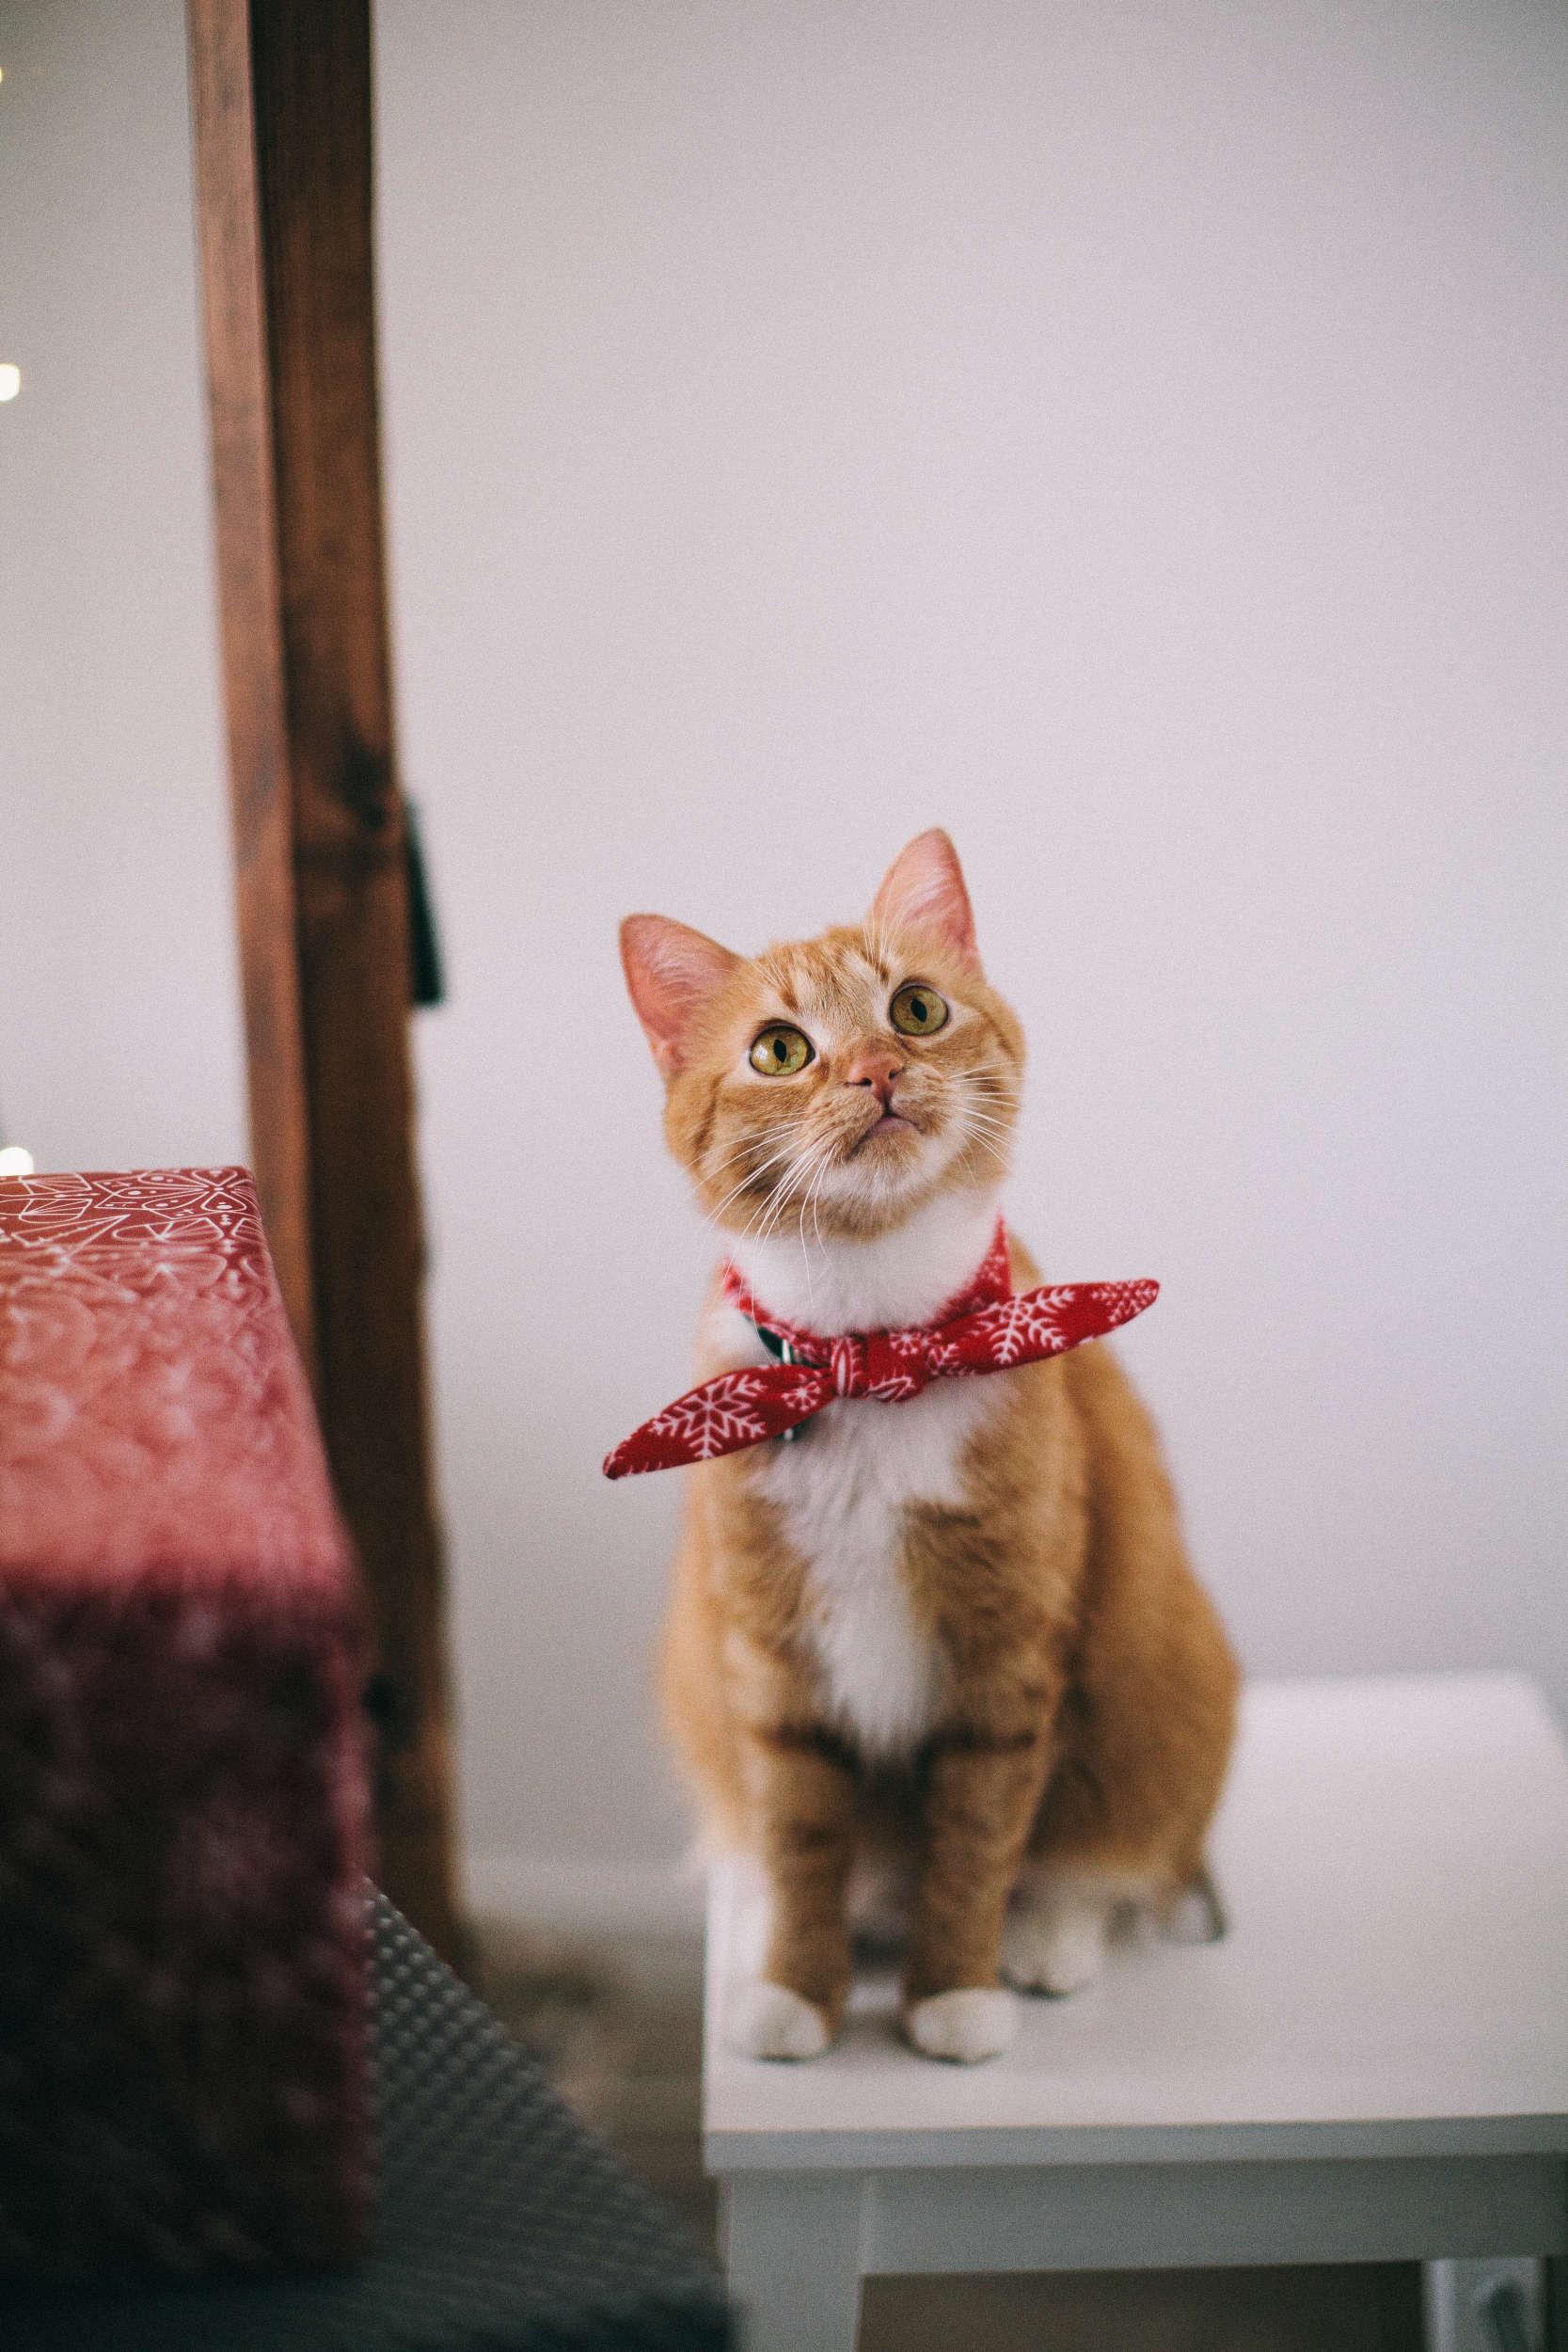 Encryption Cat